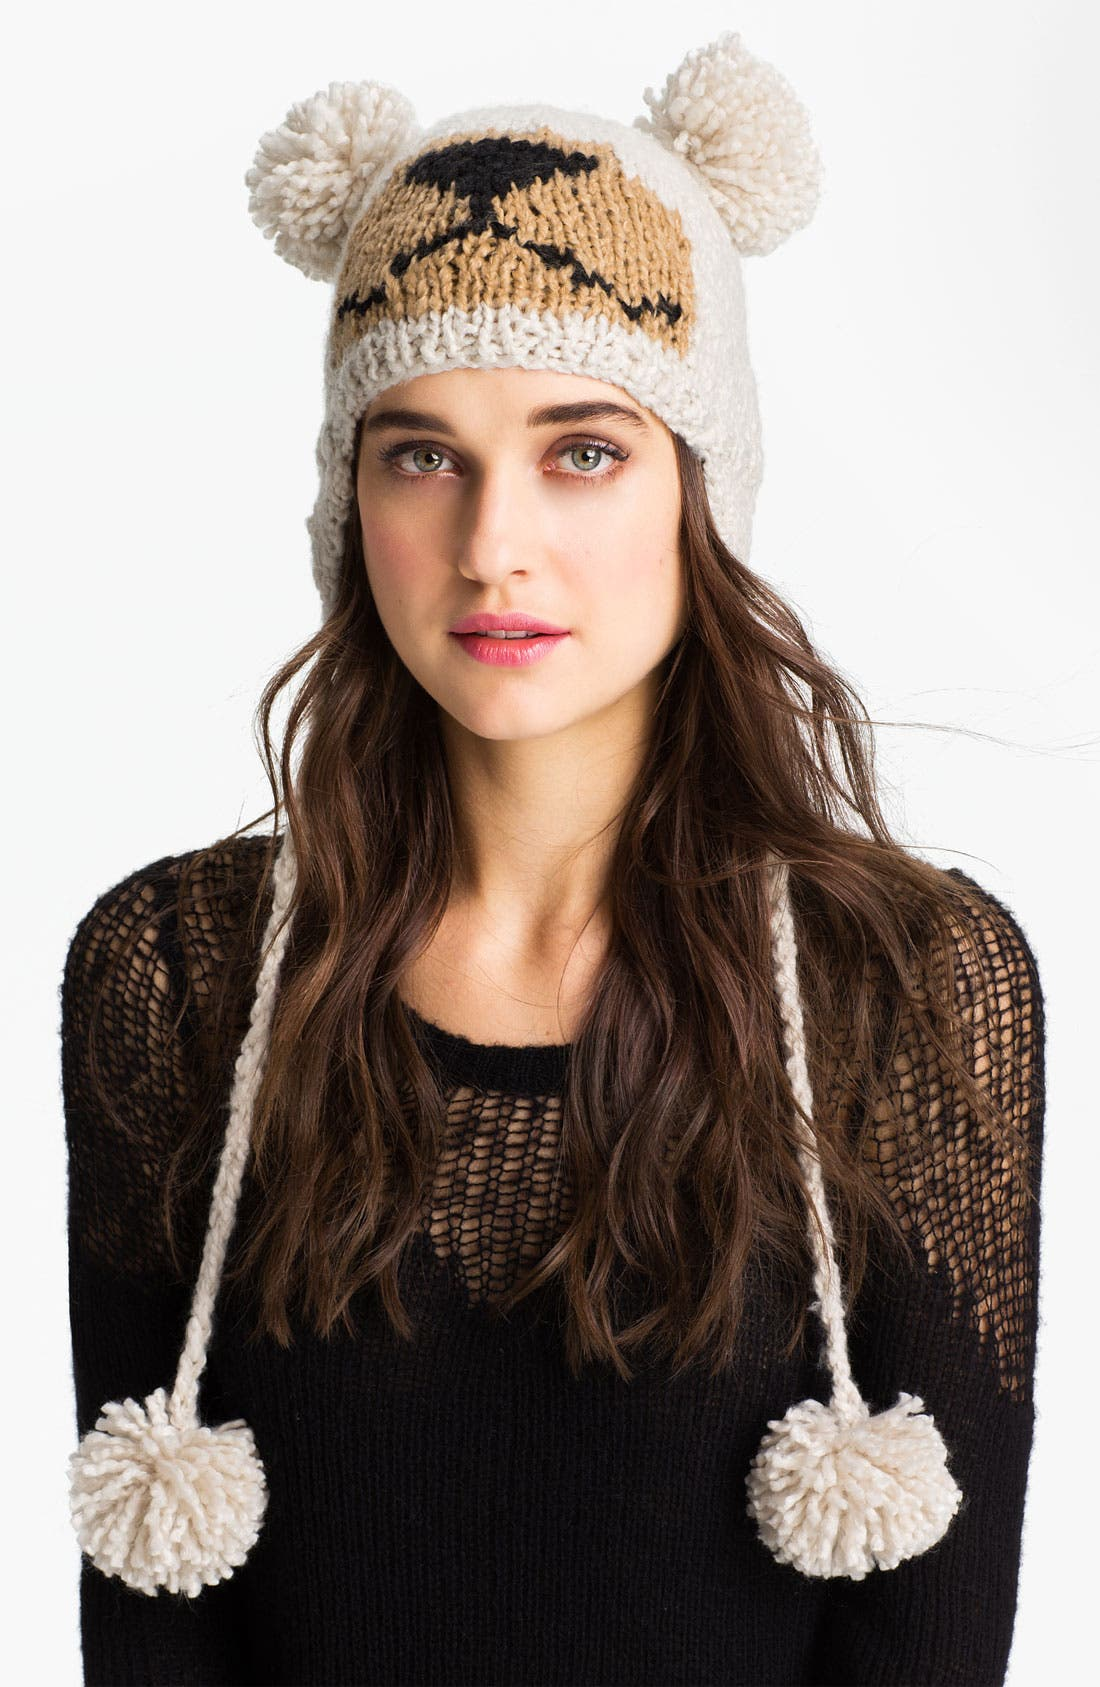 Main Image - Made of Me Accessories 'Yogi - Heidi' Hat